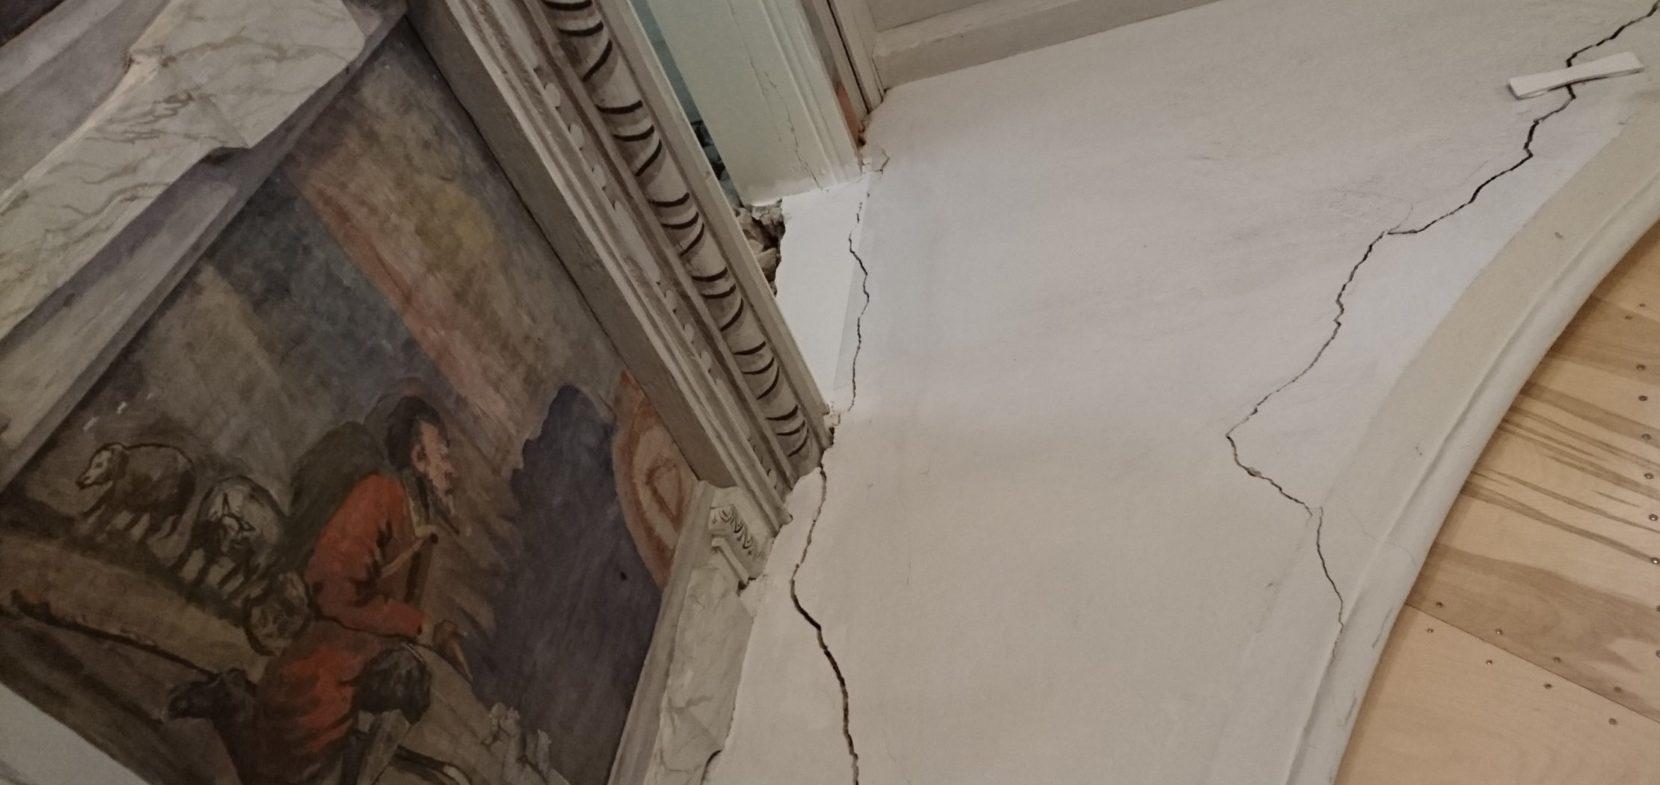 Gib festen Halt! – Risse bedrohen Leubnitzer Kirche